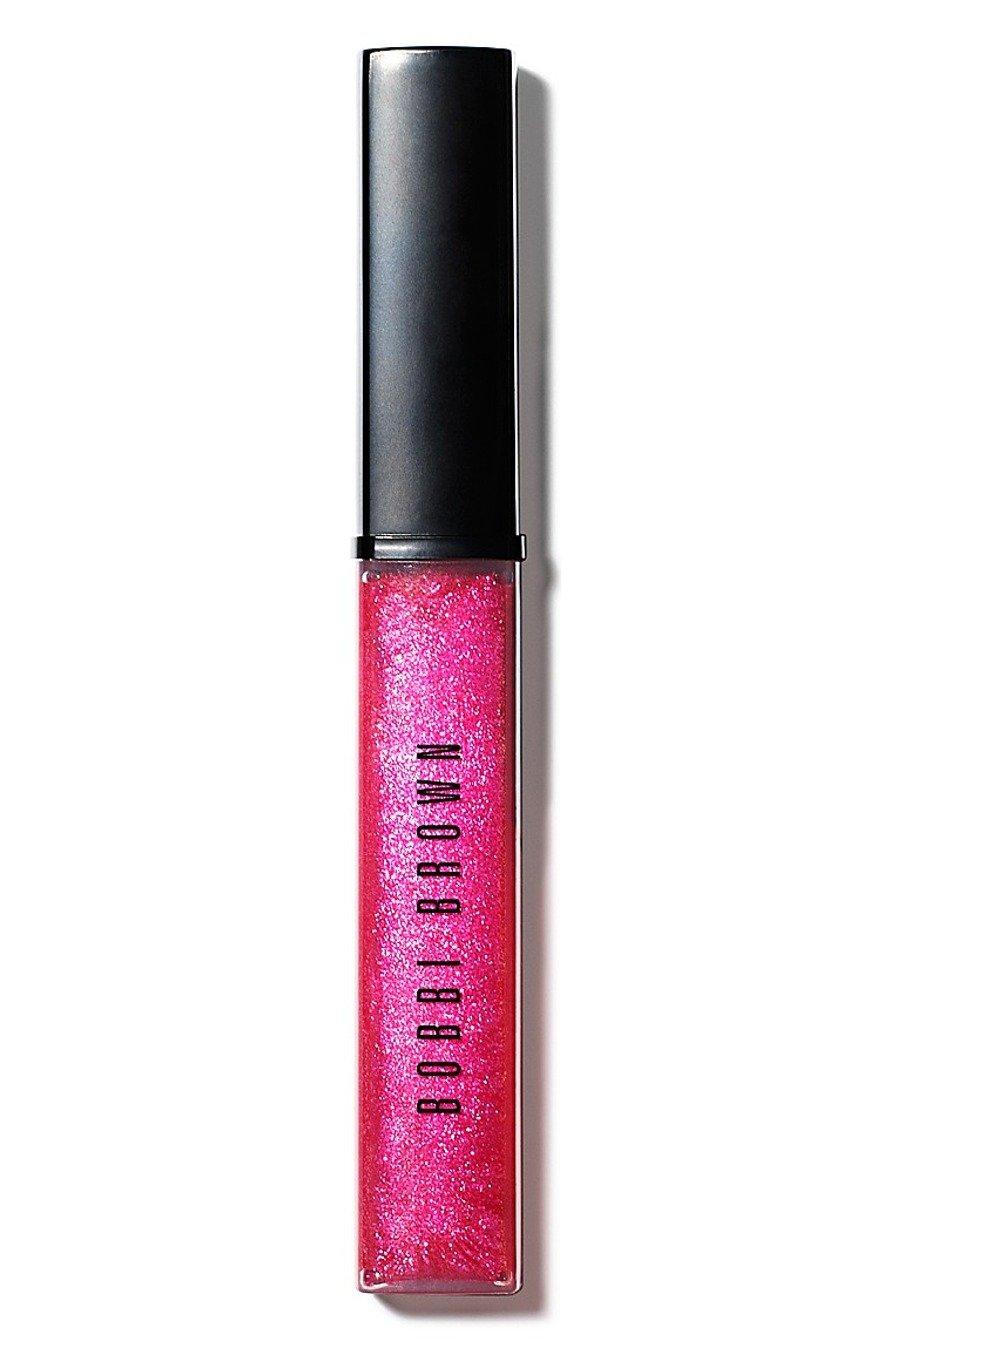 Bobbi Brown High Shimmer Lip Gloss NAKED PLUM 7 by Bobbi Brown